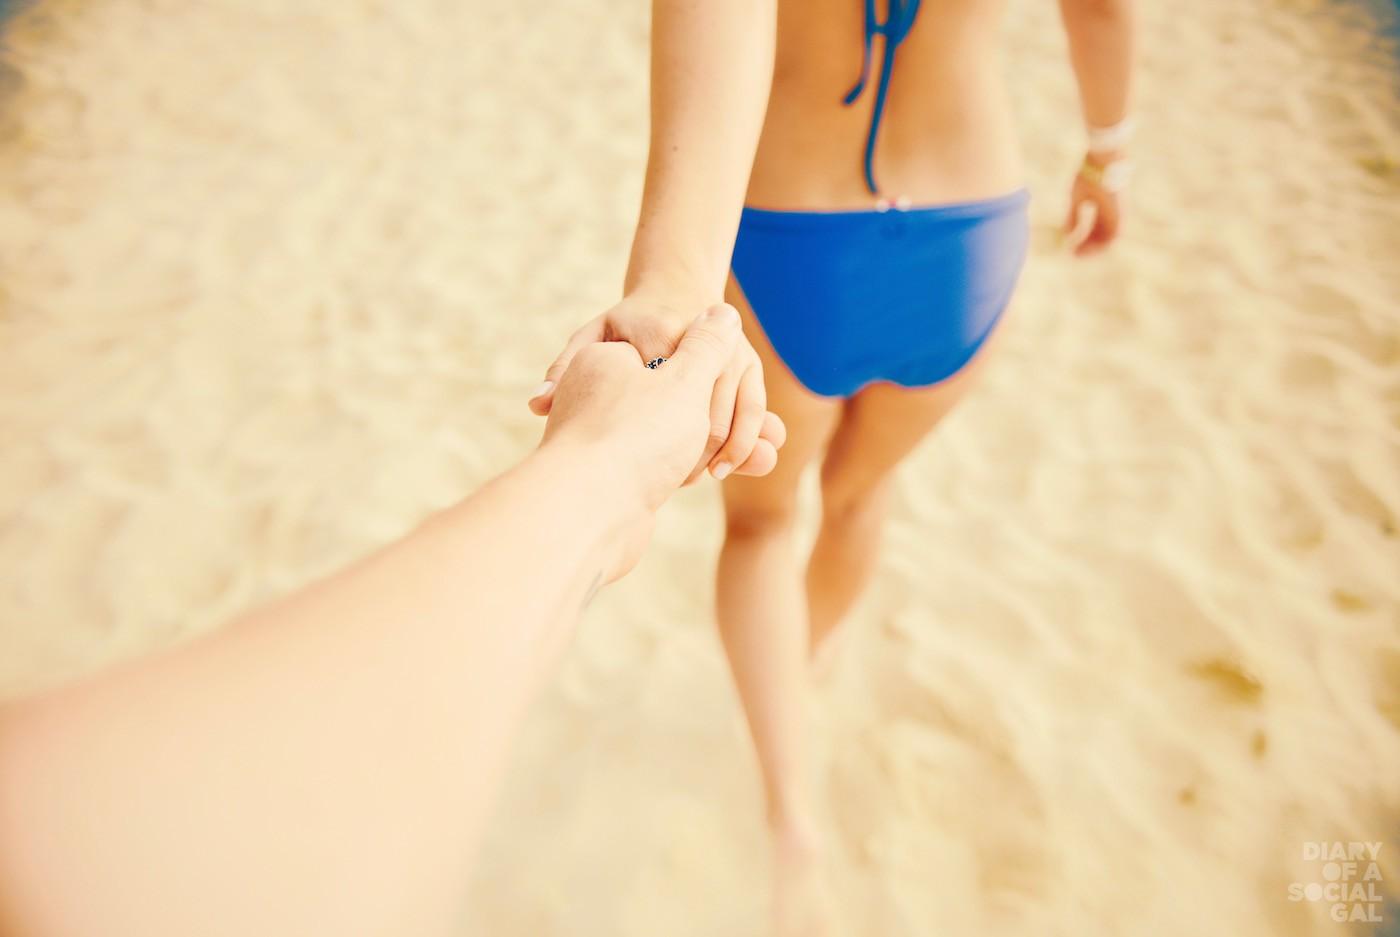 Lovers Holding Hands On Beach With Bikini (1)